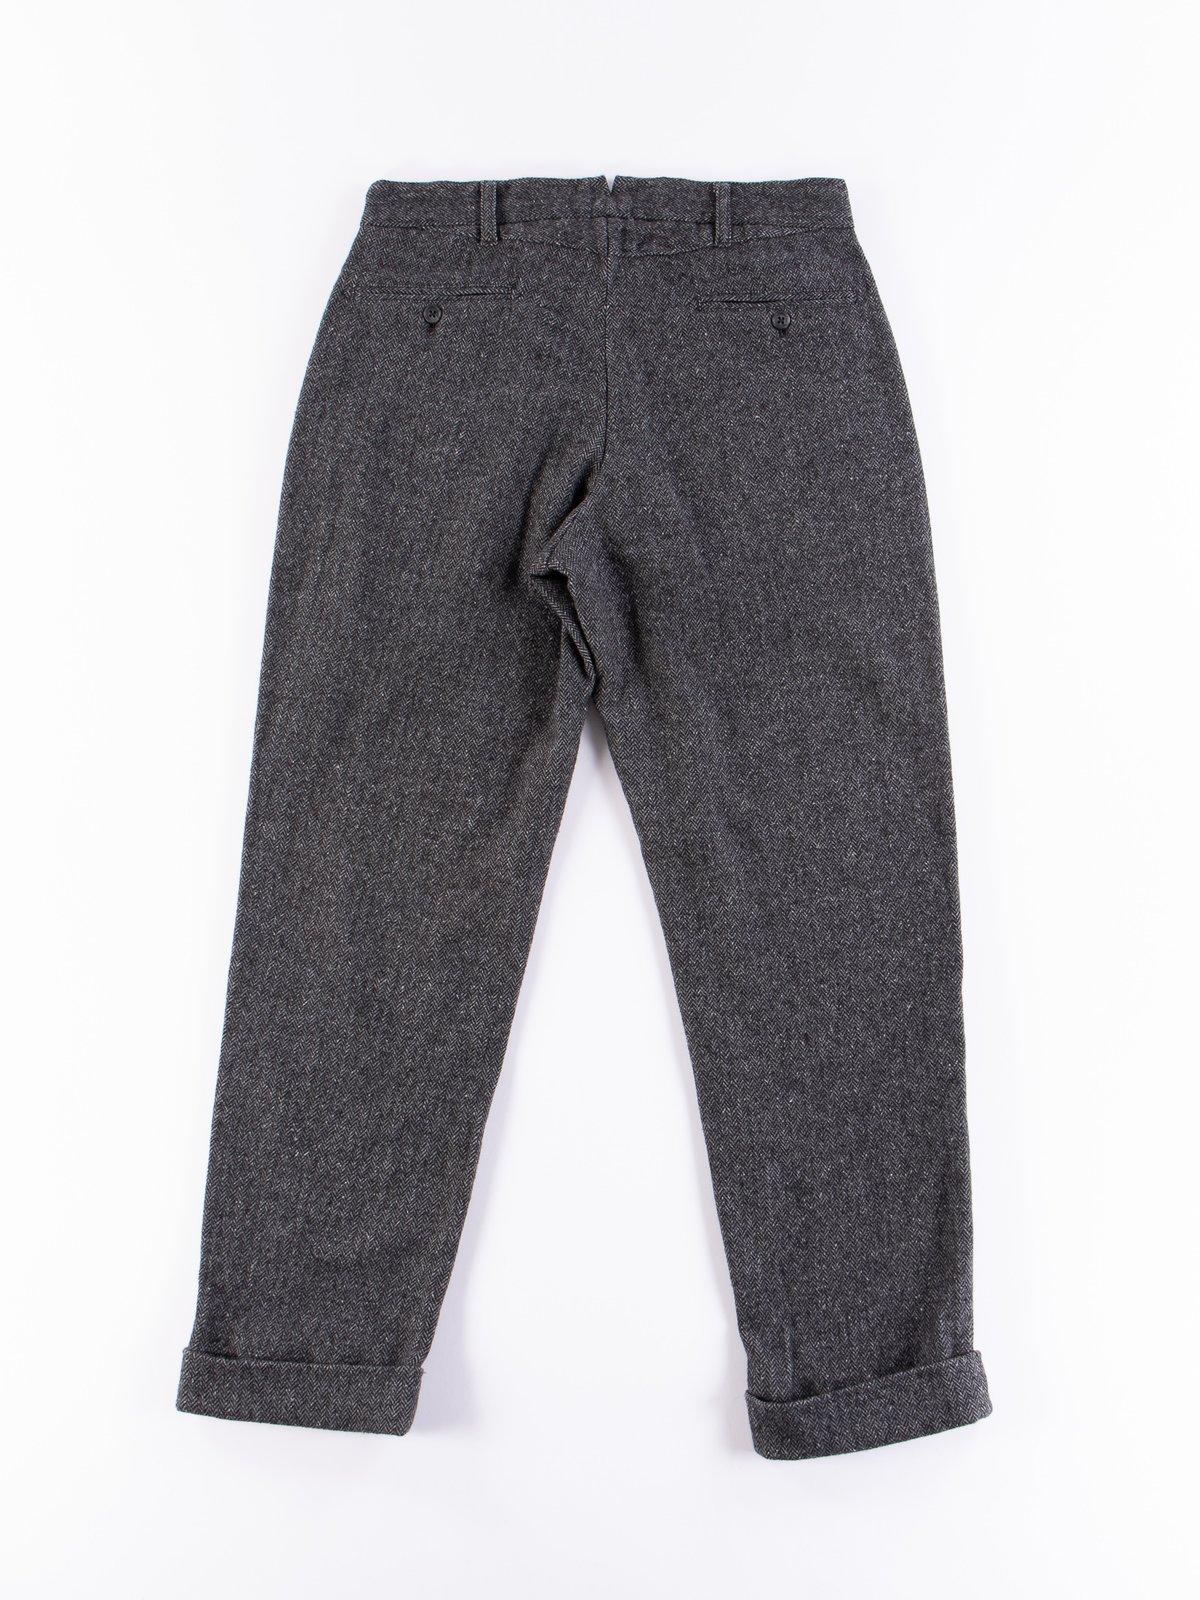 Grey Poly Wool Herringbone Andover Pant - Image 7